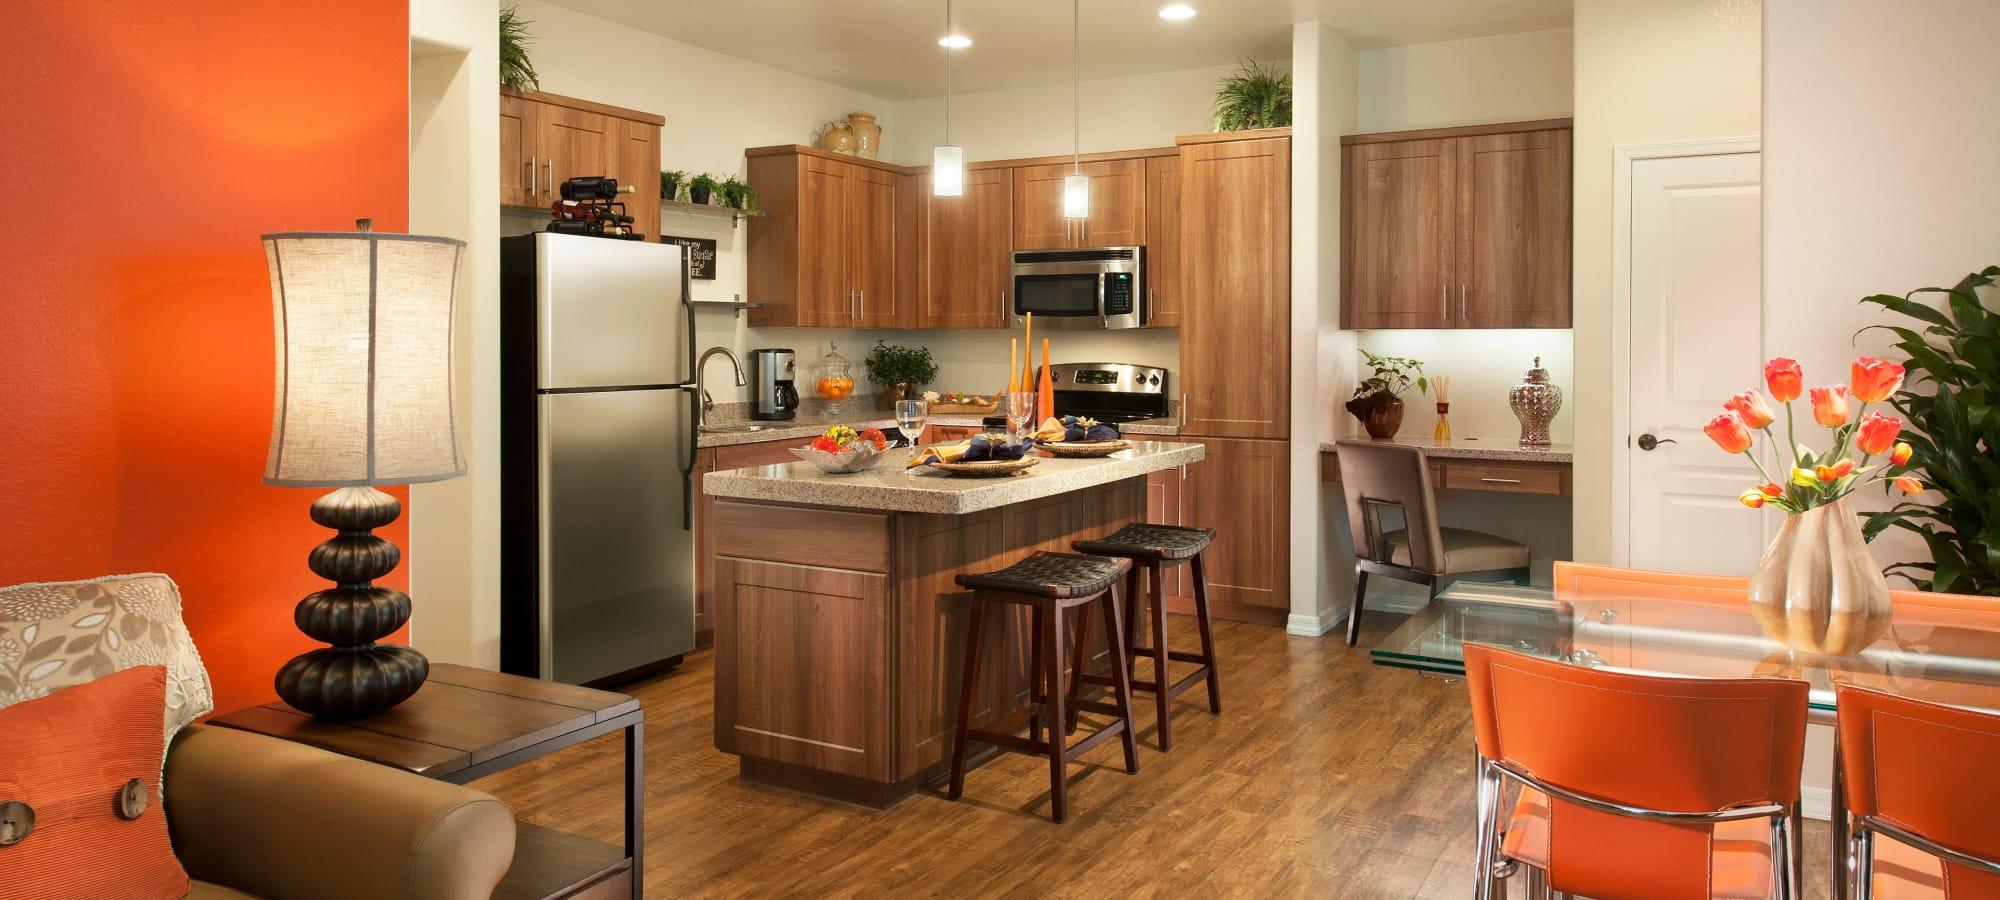 Open kitchen with breakfast bar at San Capella in Tempe, Arizona